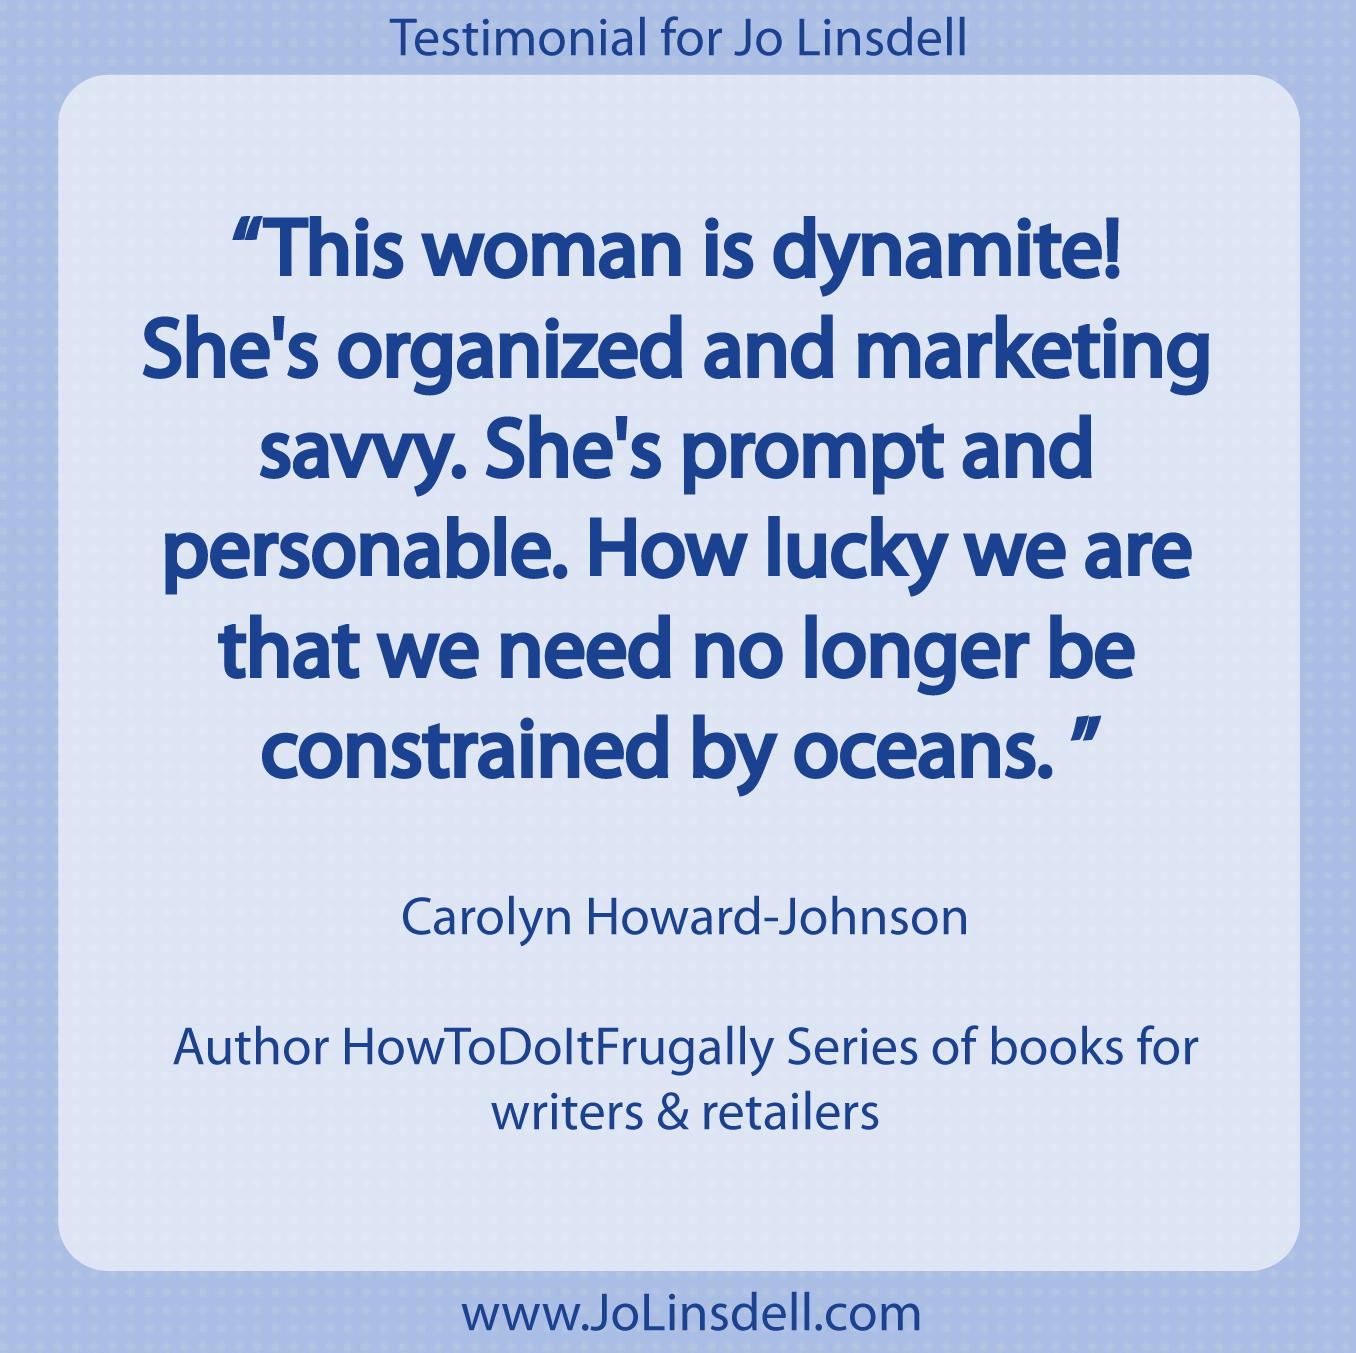 Testimonial for Jo Linsdell by Carolyn Howard Johnson